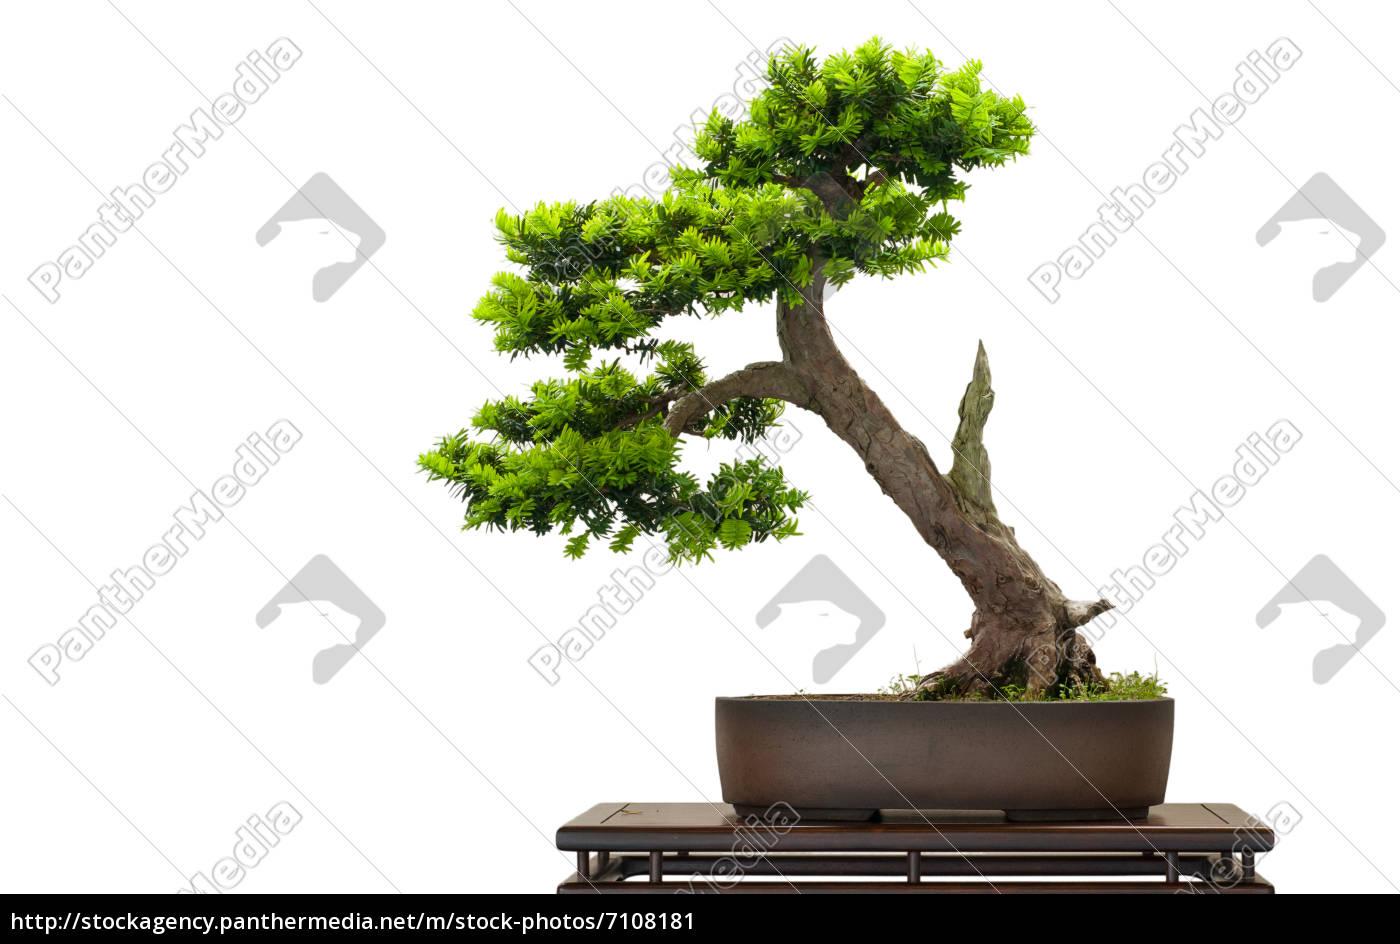 japanische eibe als bonsai baum lizenzfreies bild. Black Bedroom Furniture Sets. Home Design Ideas